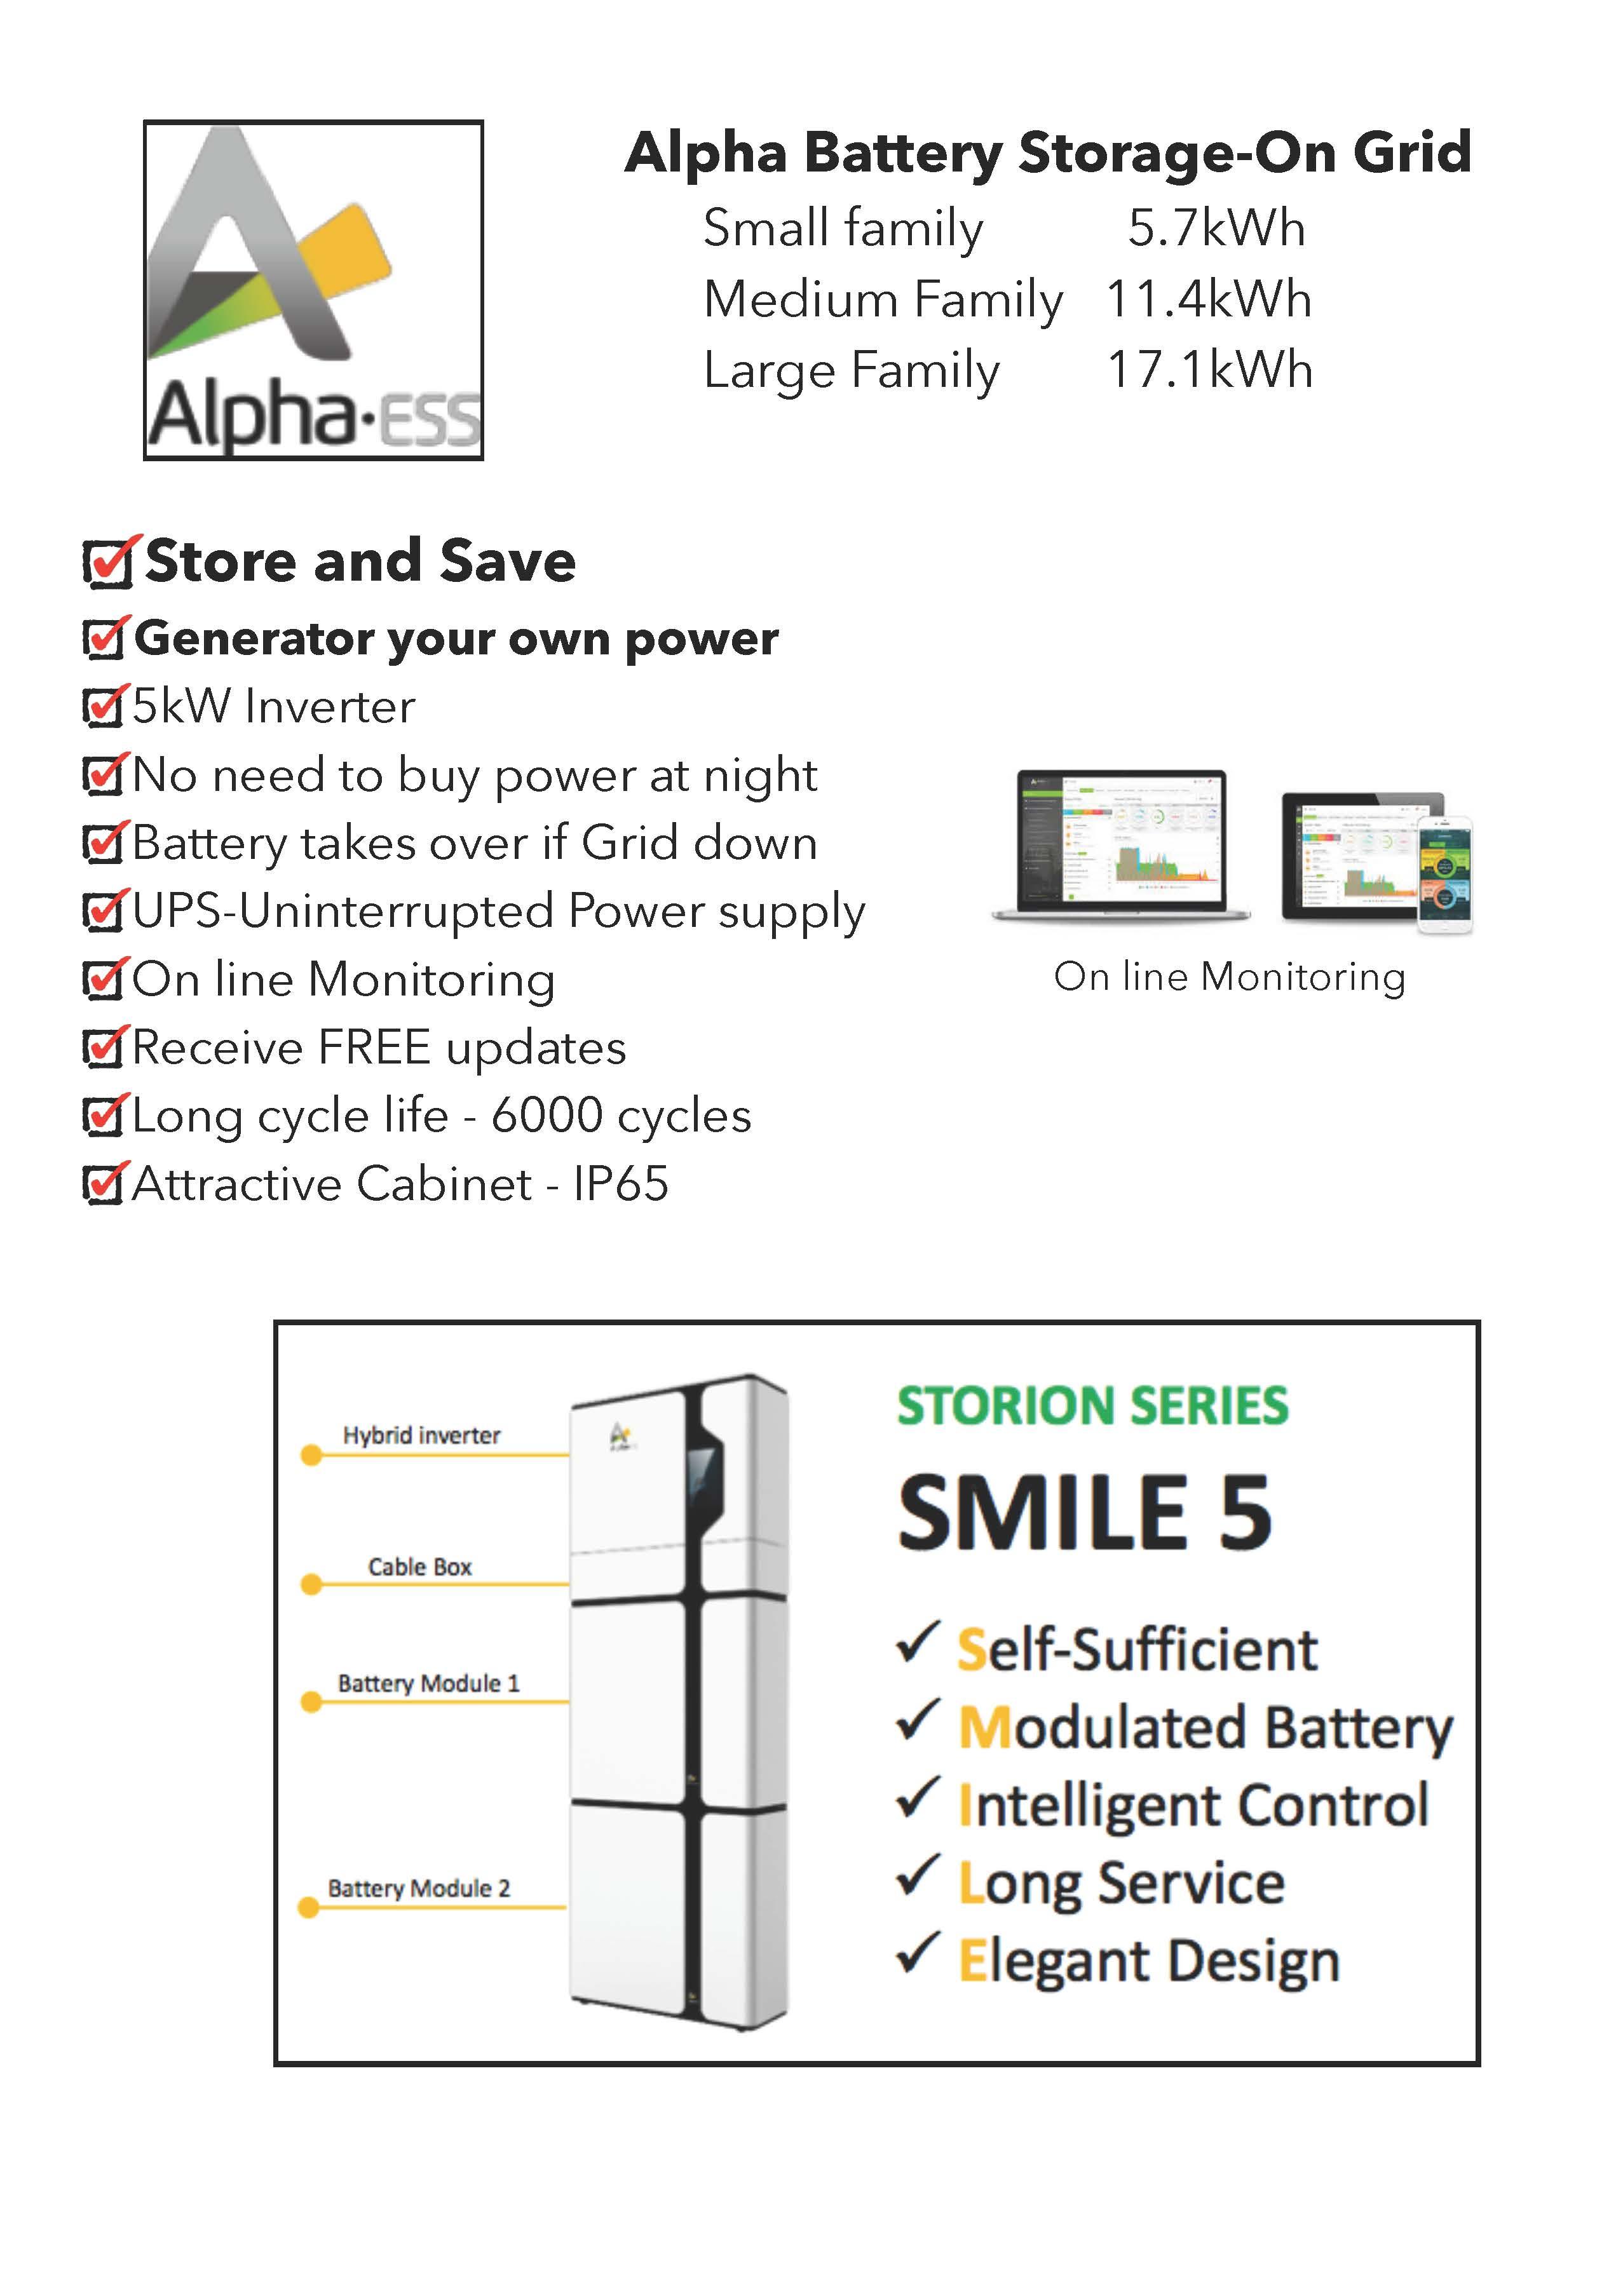 Impact Solar Battery Storage Sunshine Coast Qld Alpha Charger Wiring Diagram Manual En Storion Smile 5 Specifications Batt M48112 P